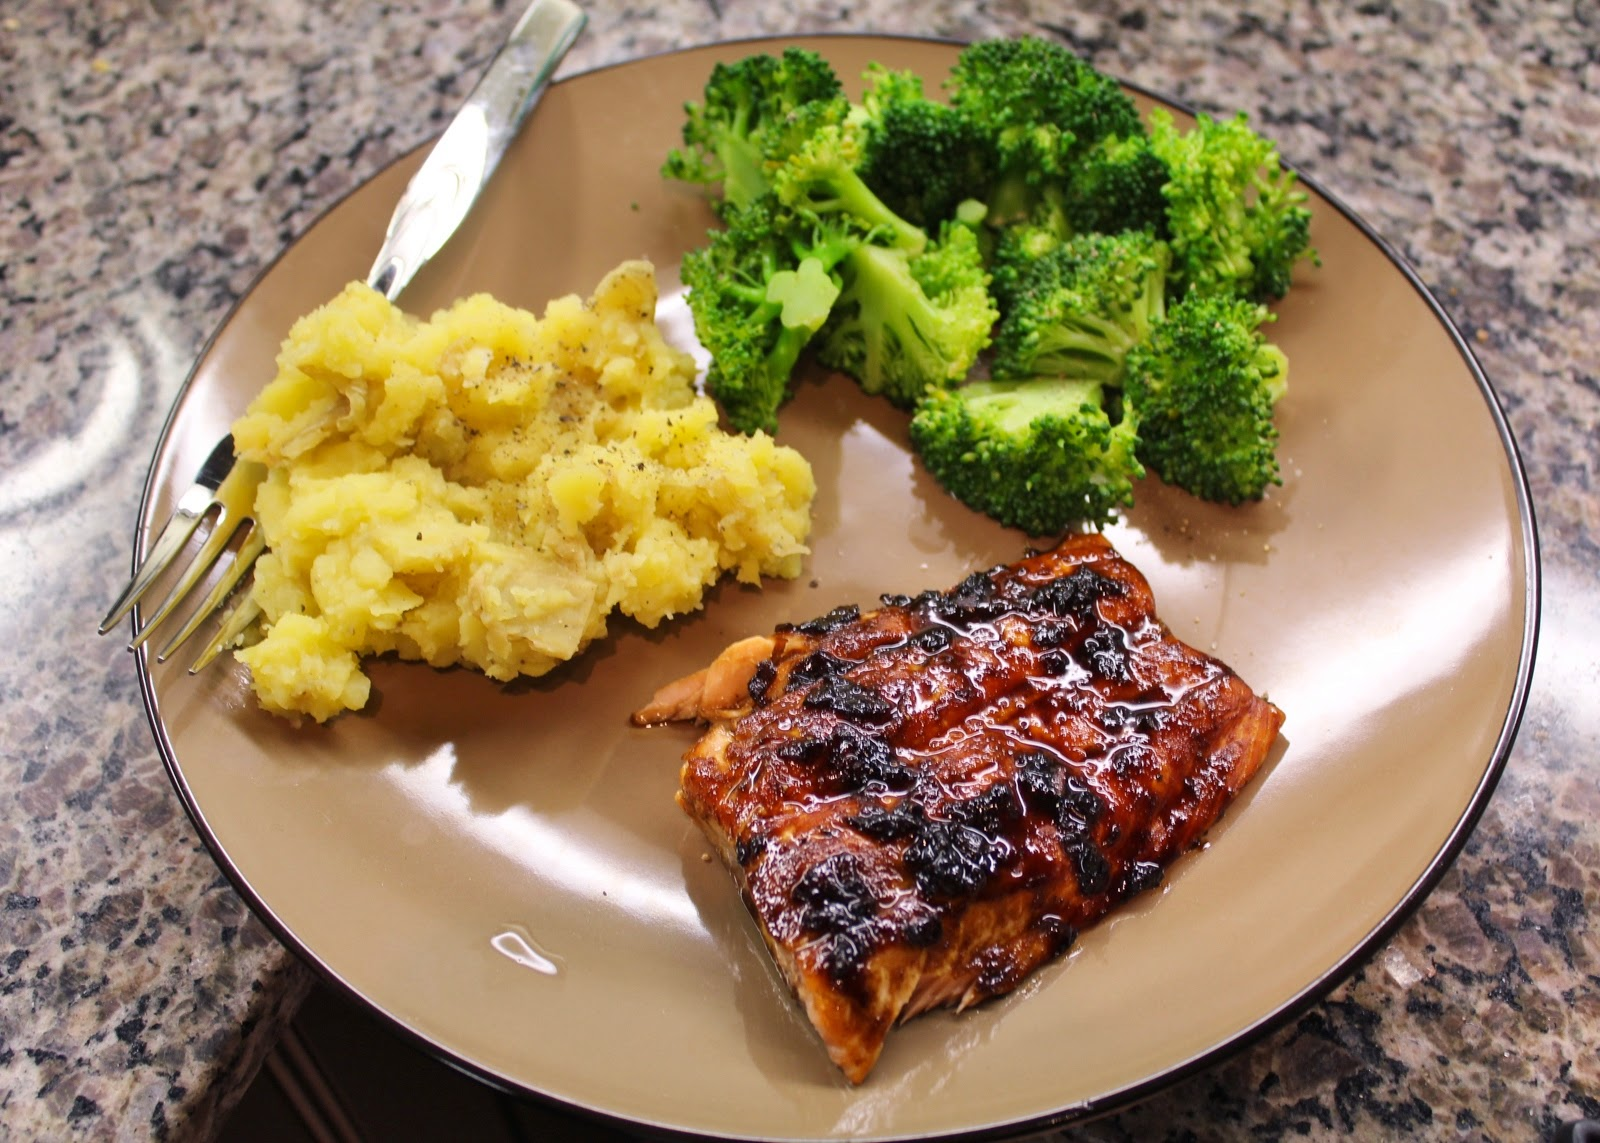 Salmon, mashed potatoes, and broccoli